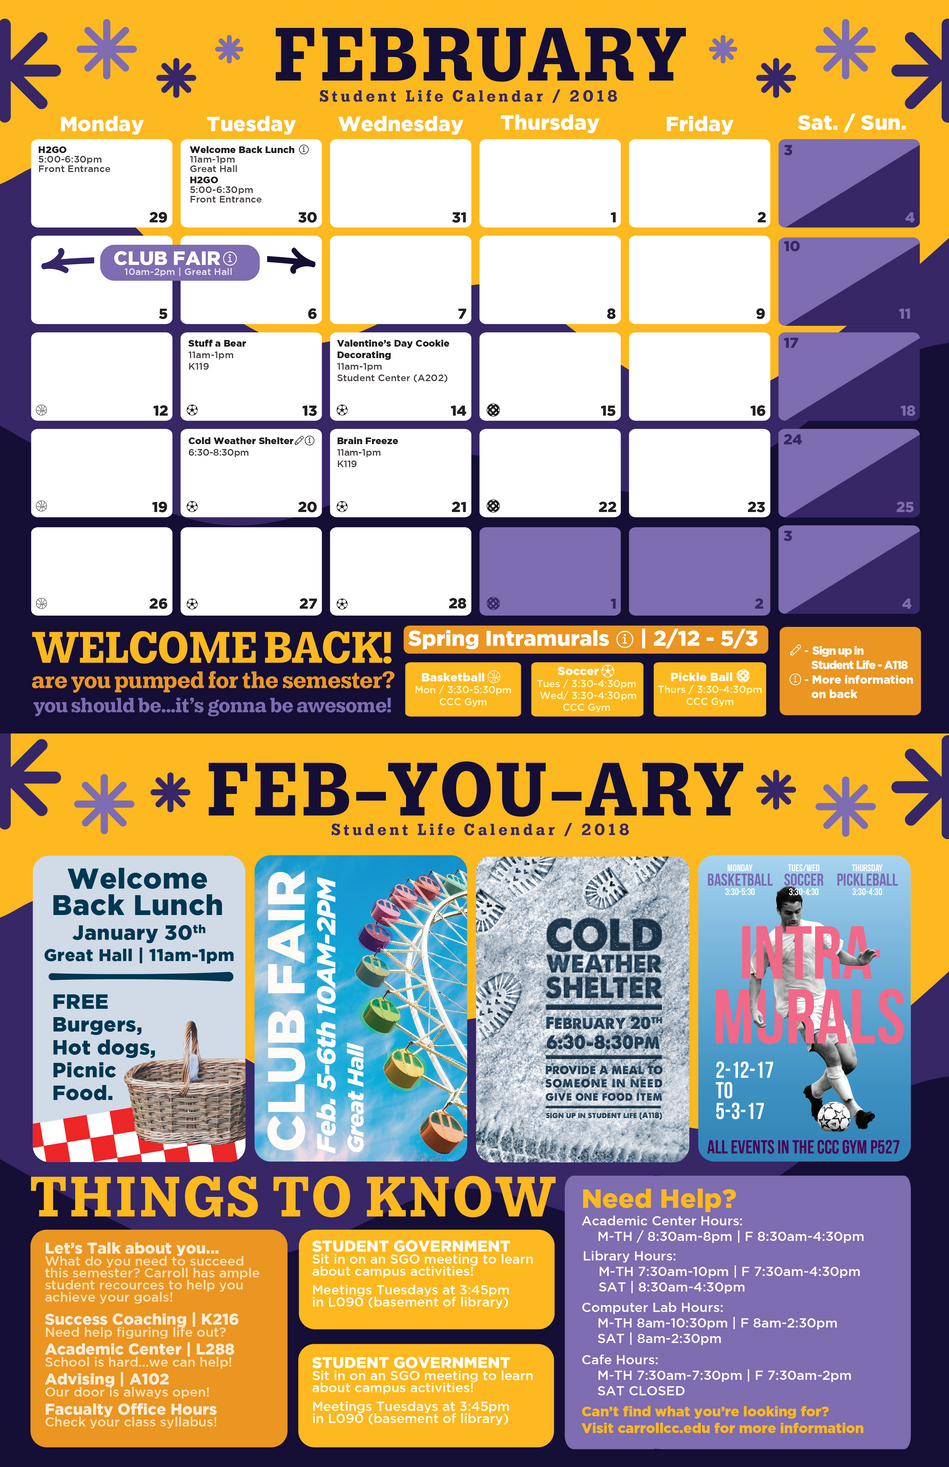 February Carroll Student Life Office Calendar